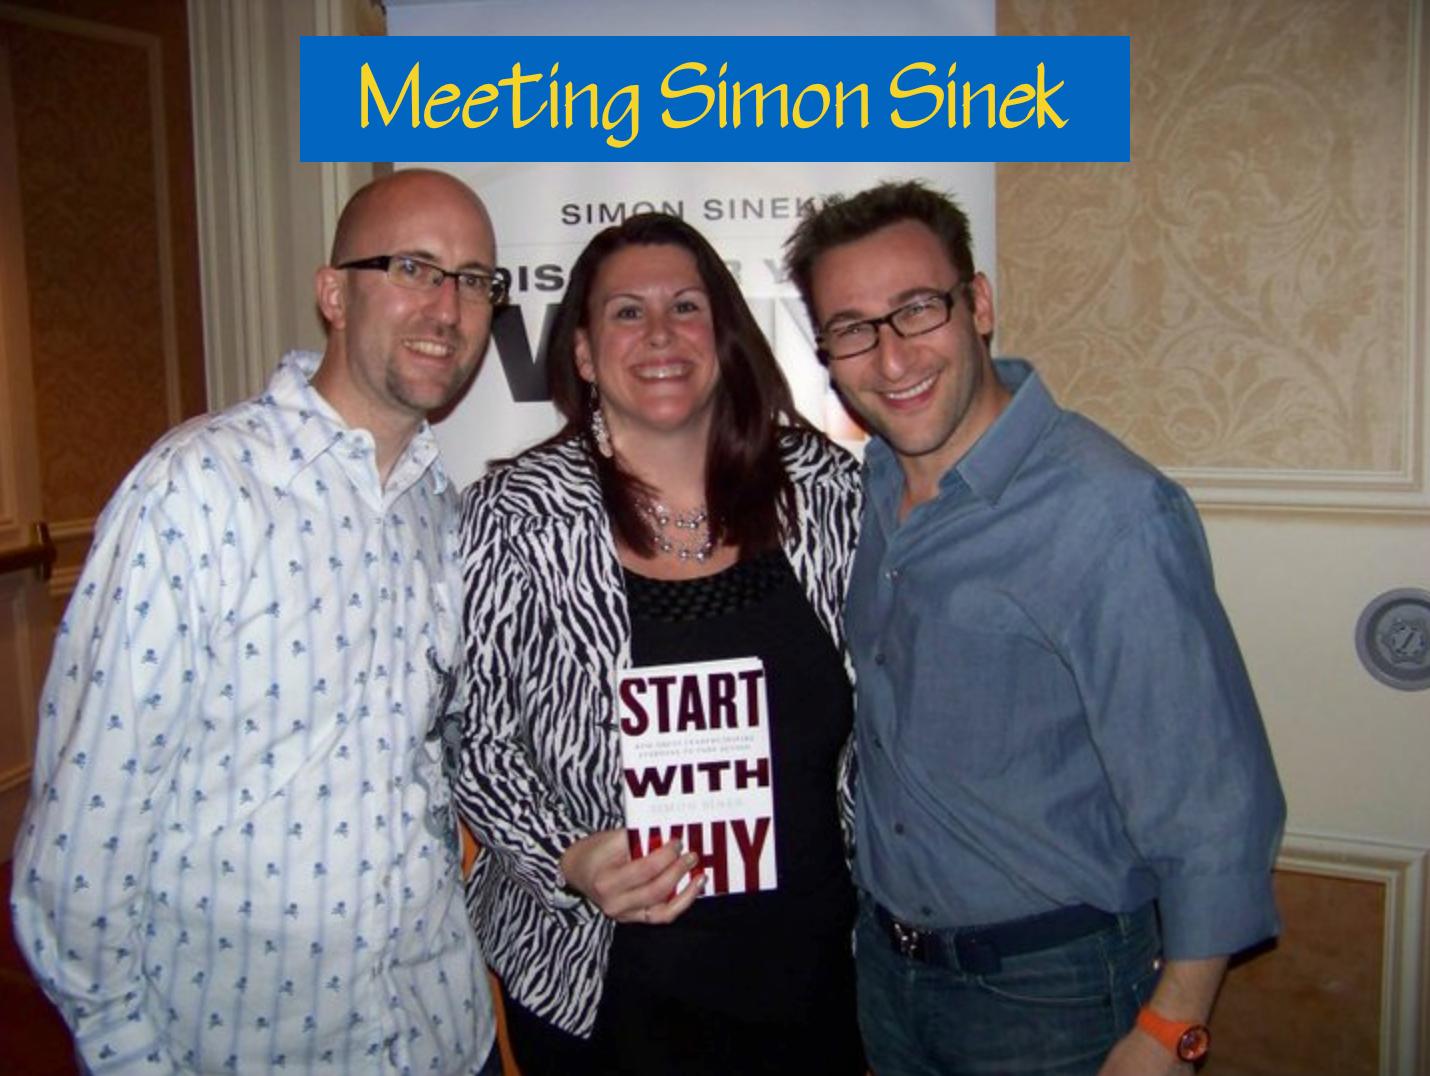 Meeting simon sinek start with why